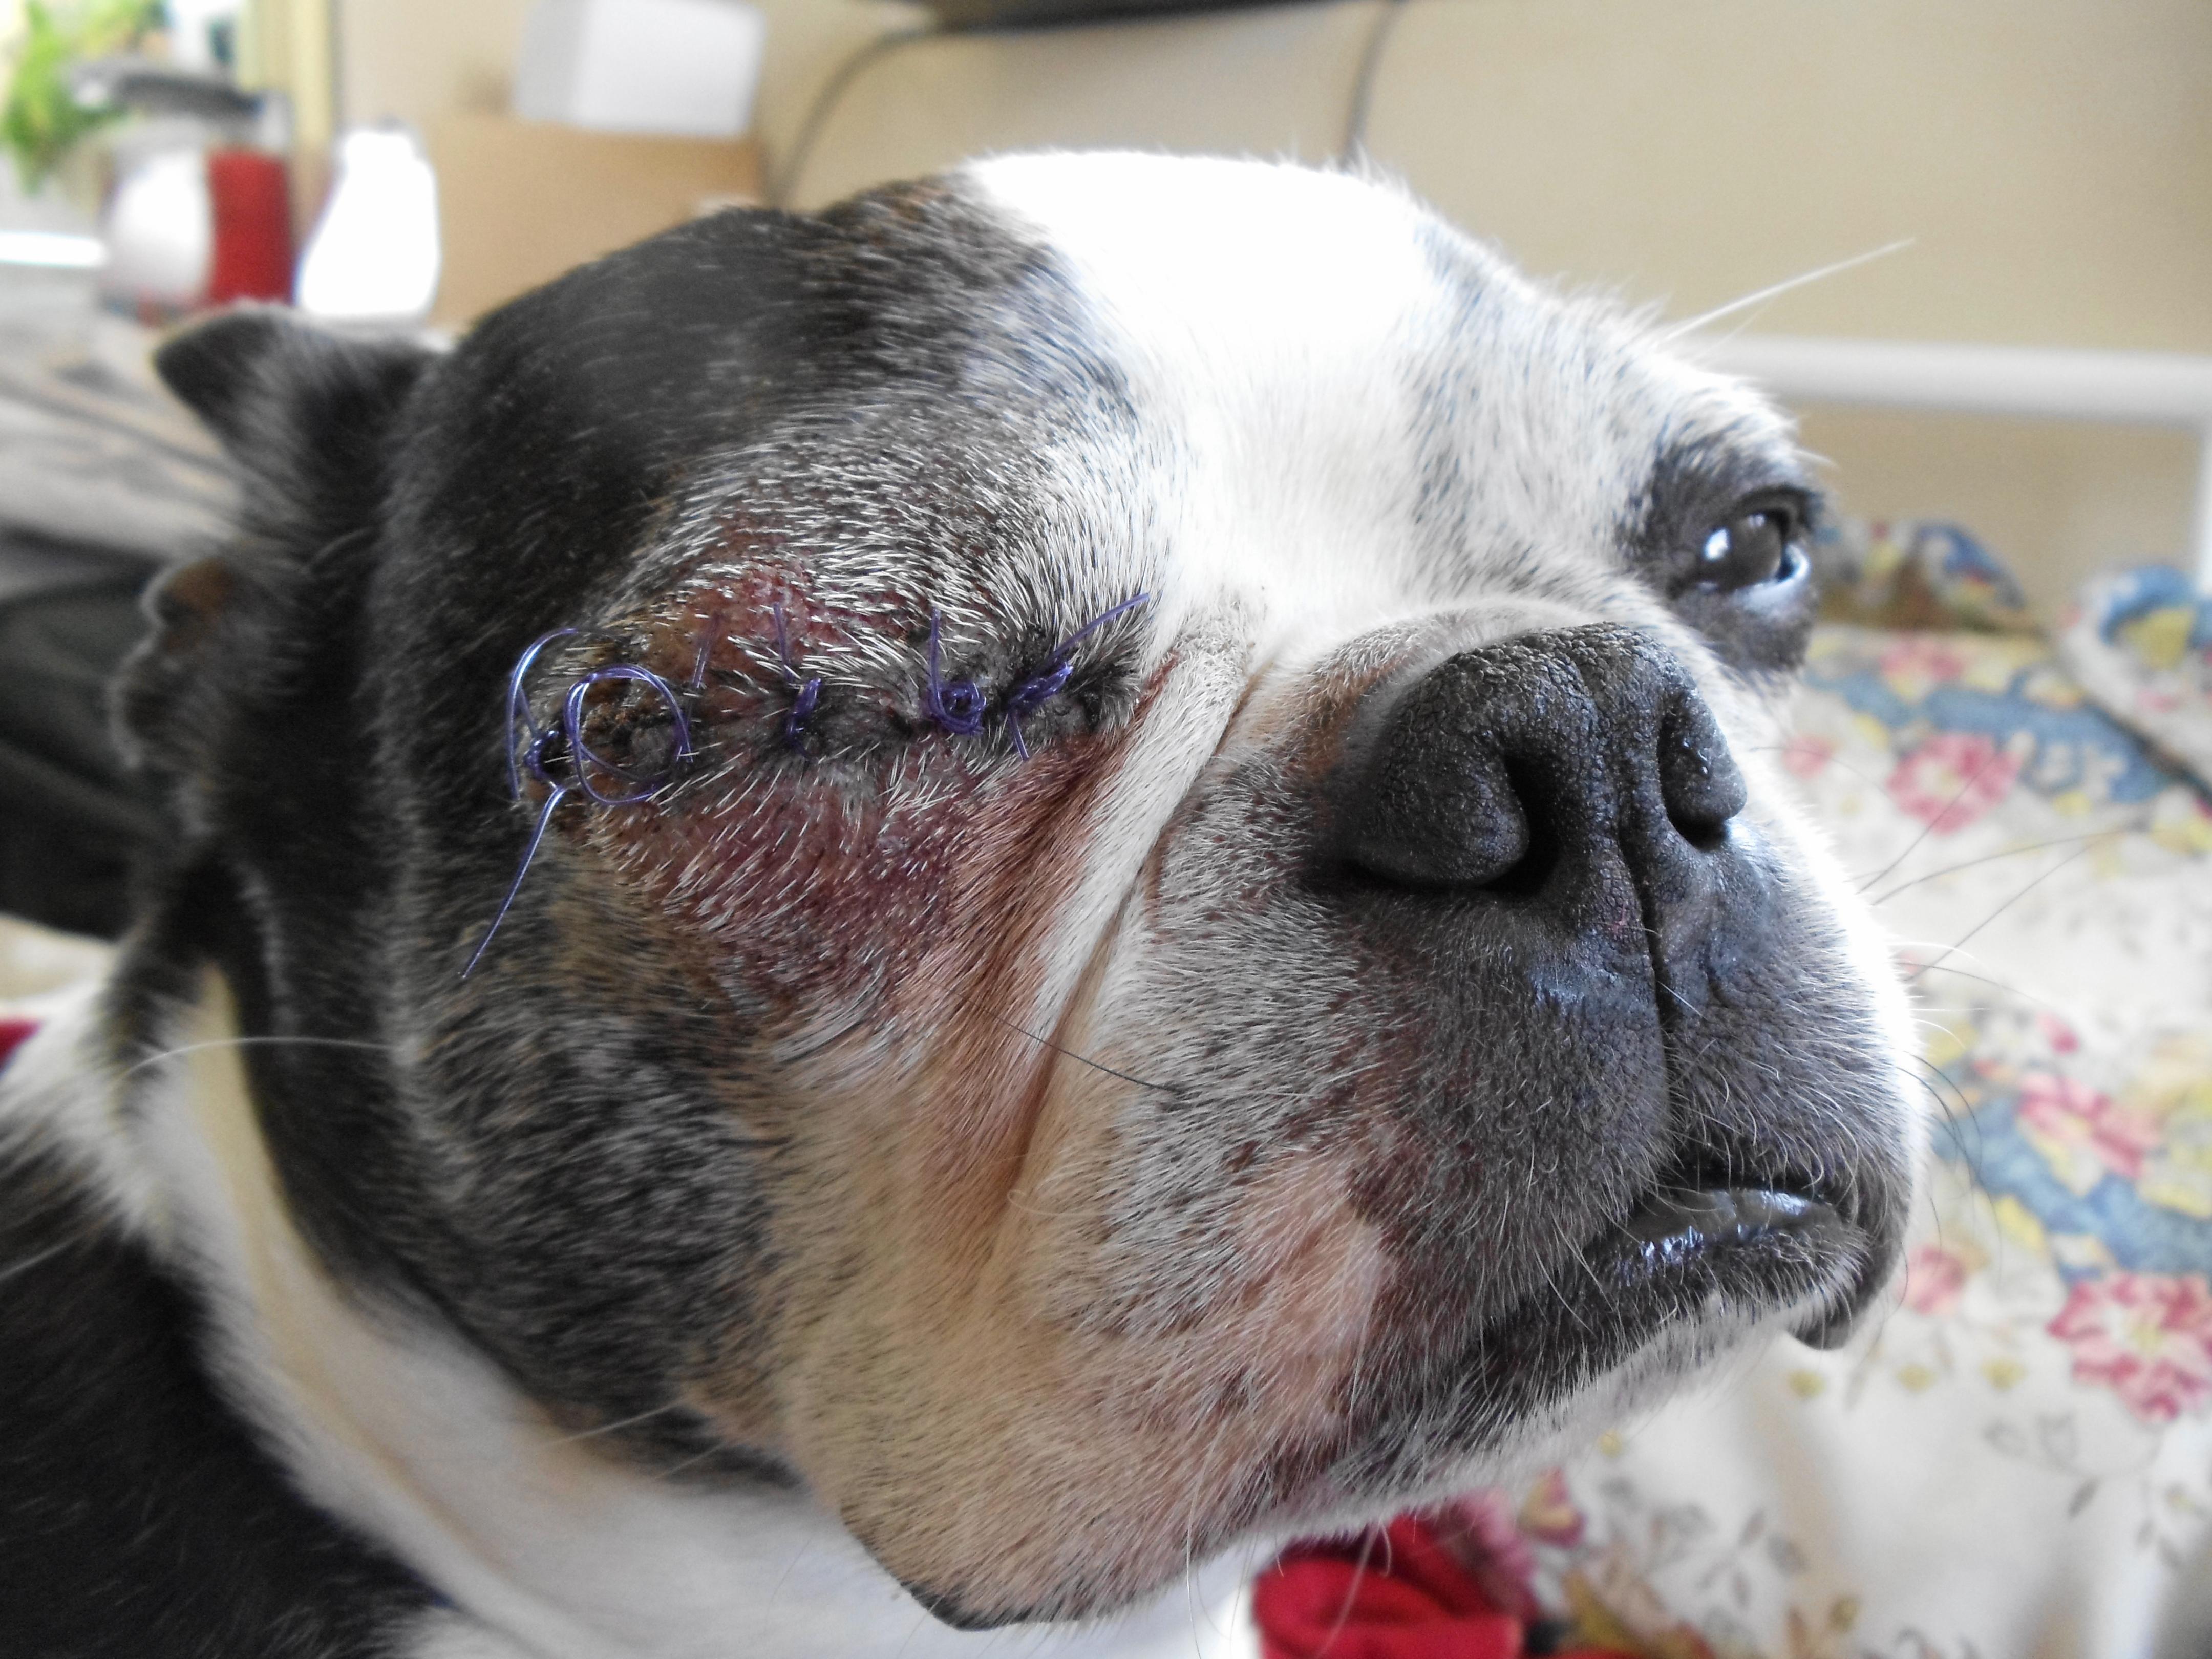 Dainty It Is Now Days Post May 2013 Roxannesrandoms Dog Swollen Bee Sting Dog Swollen Shut Treatment Surgery Was On Friday bark post Dog Eye Swollen